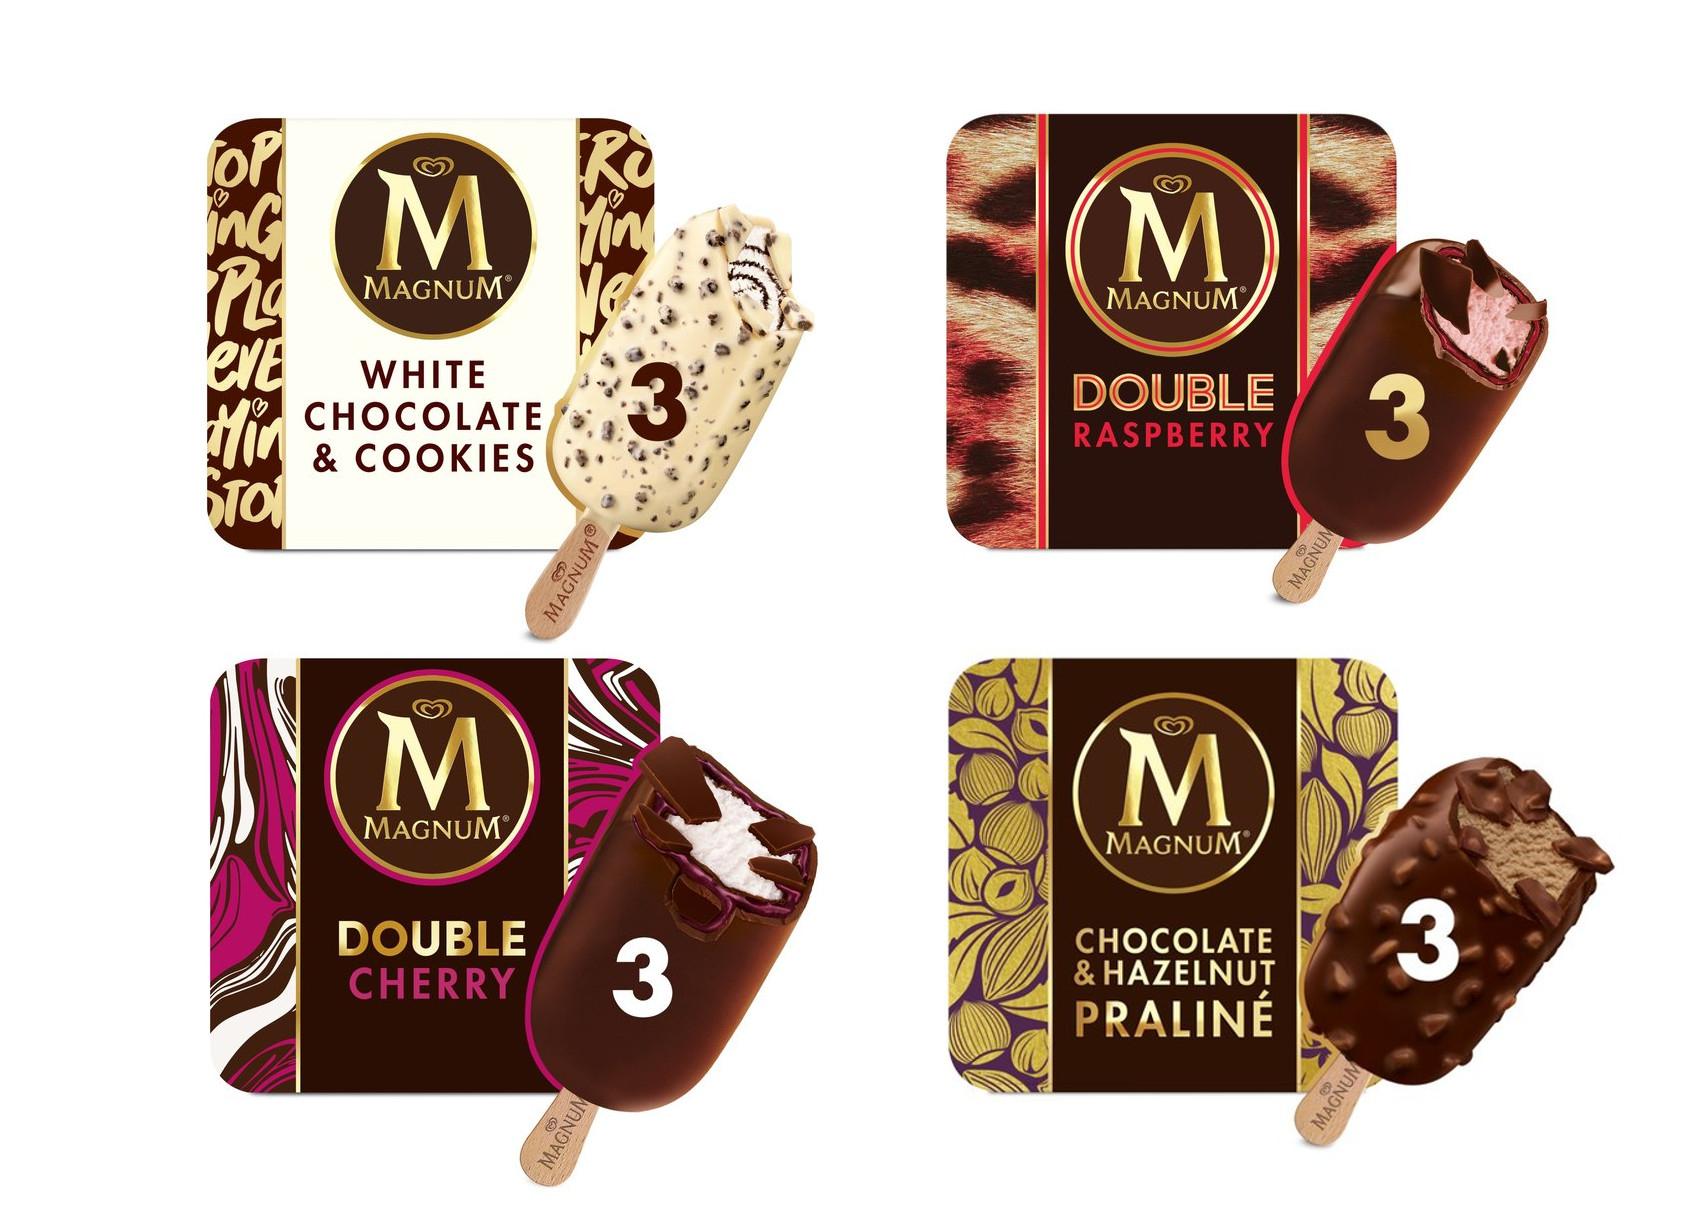 Magnum Double Raspberry / Double Cherry / White Chocolate & Cookies / Chocolate & Hazelnut Praline Ice-cream Pack of 3 - £1.75 @ Sainsburys